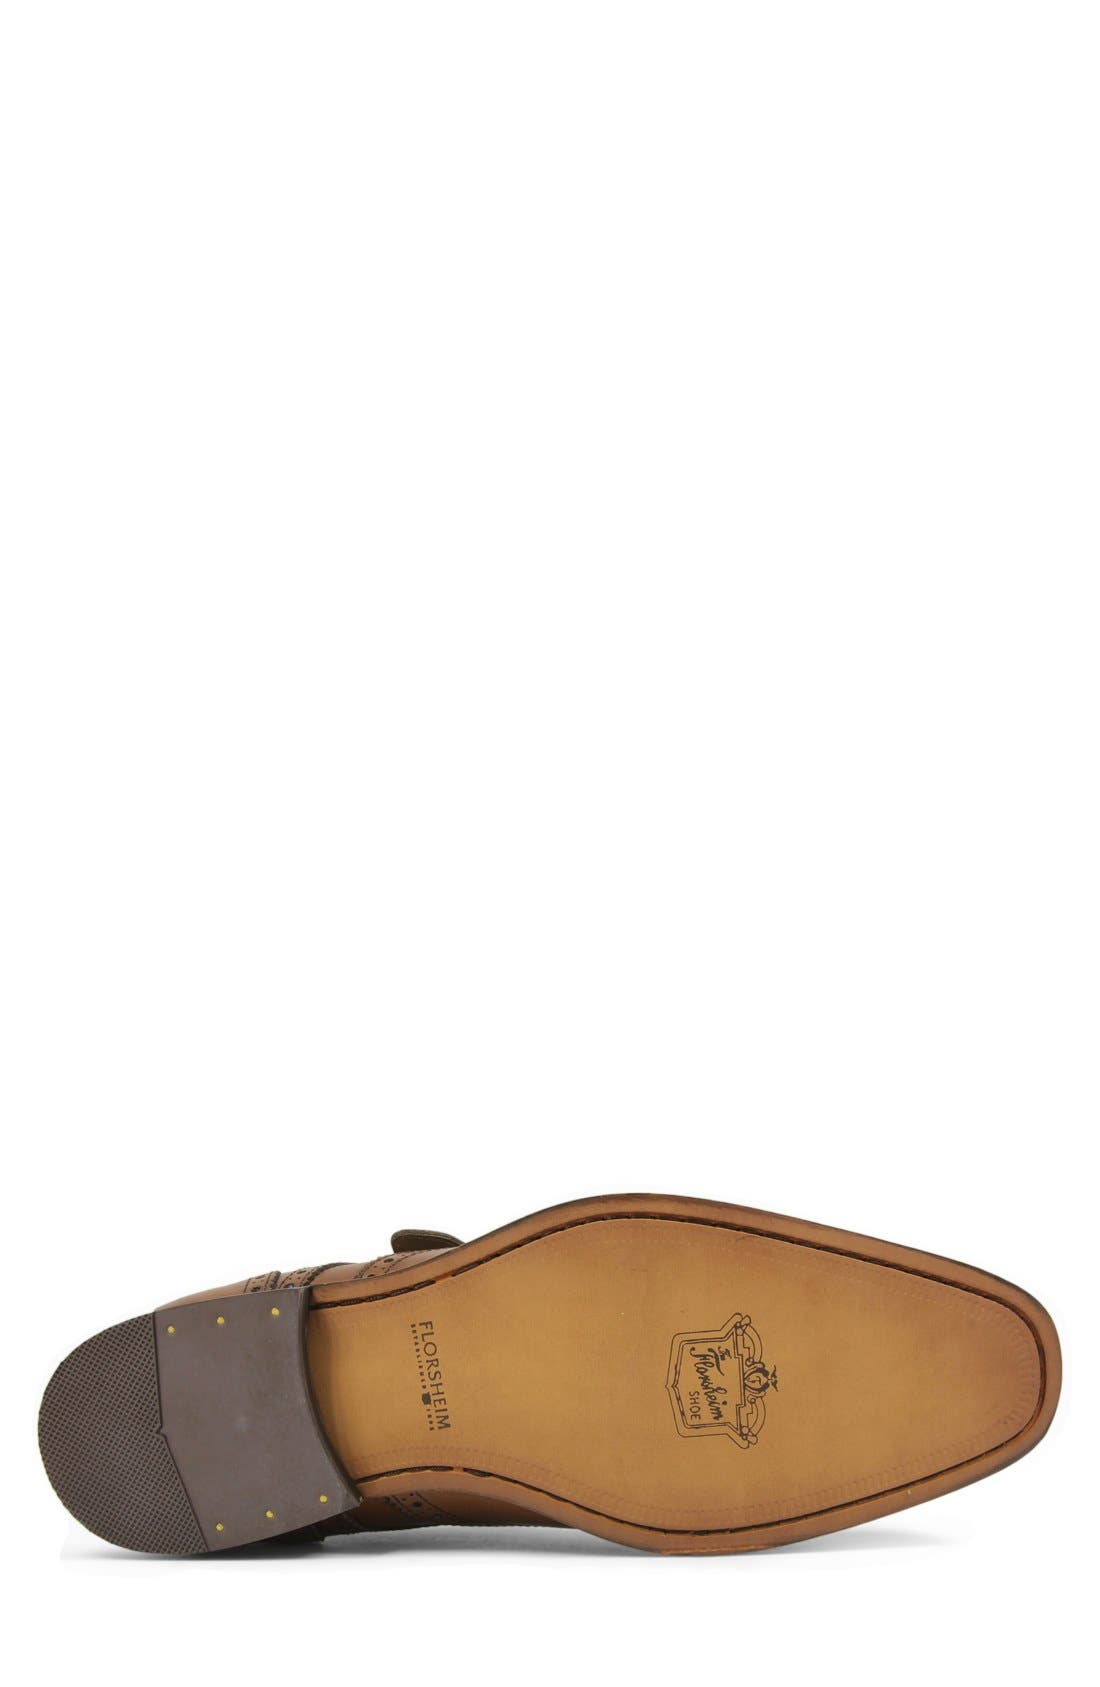 FLORSHEIM, 'Sabato' Wingtip Monk Strap Shoe, Alternate thumbnail 4, color, MEDIUM BROWN